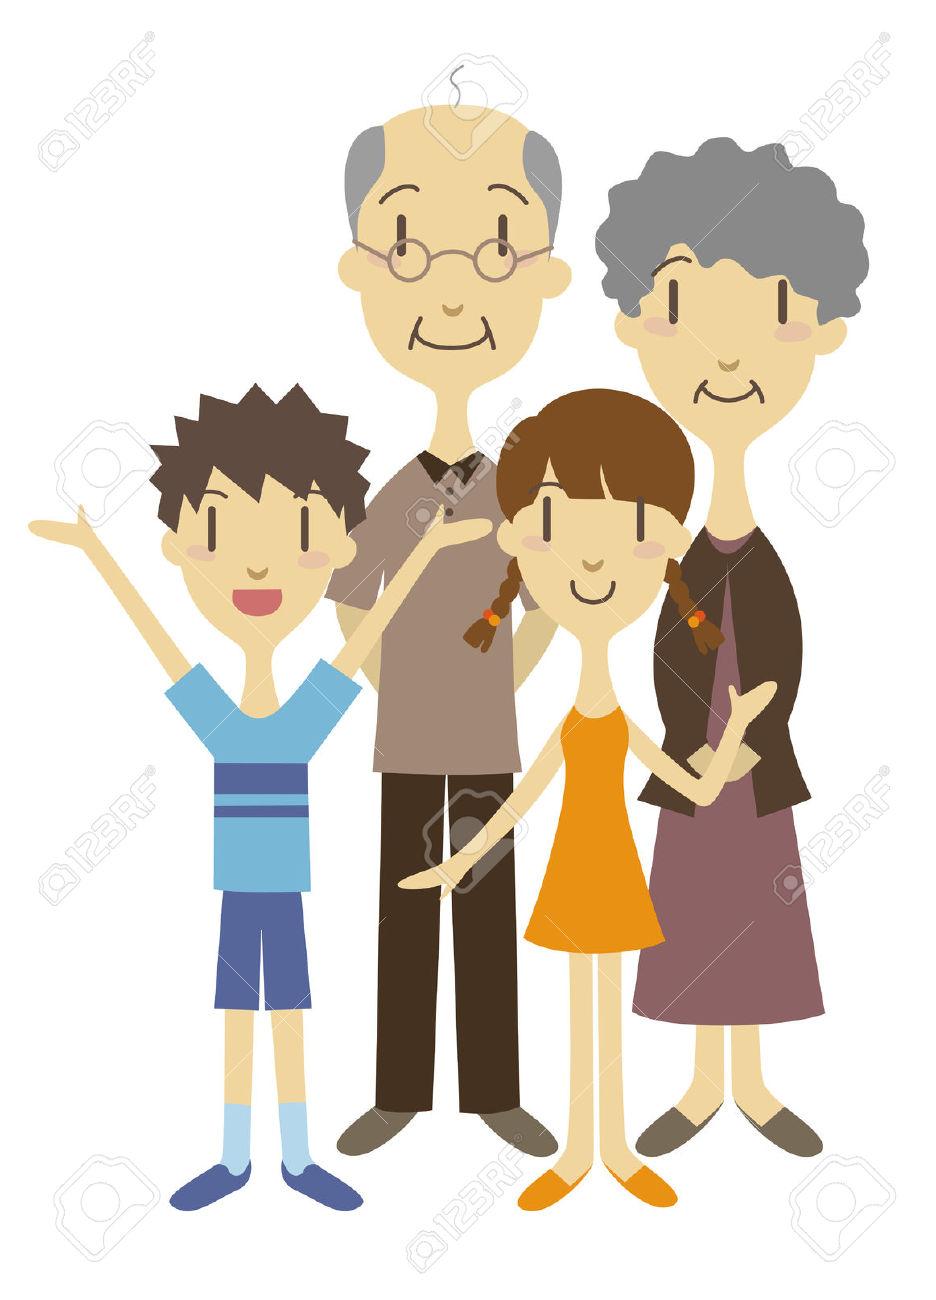 936x1300 Grandparents Clipart, Suggestions For Grandparents Clipart